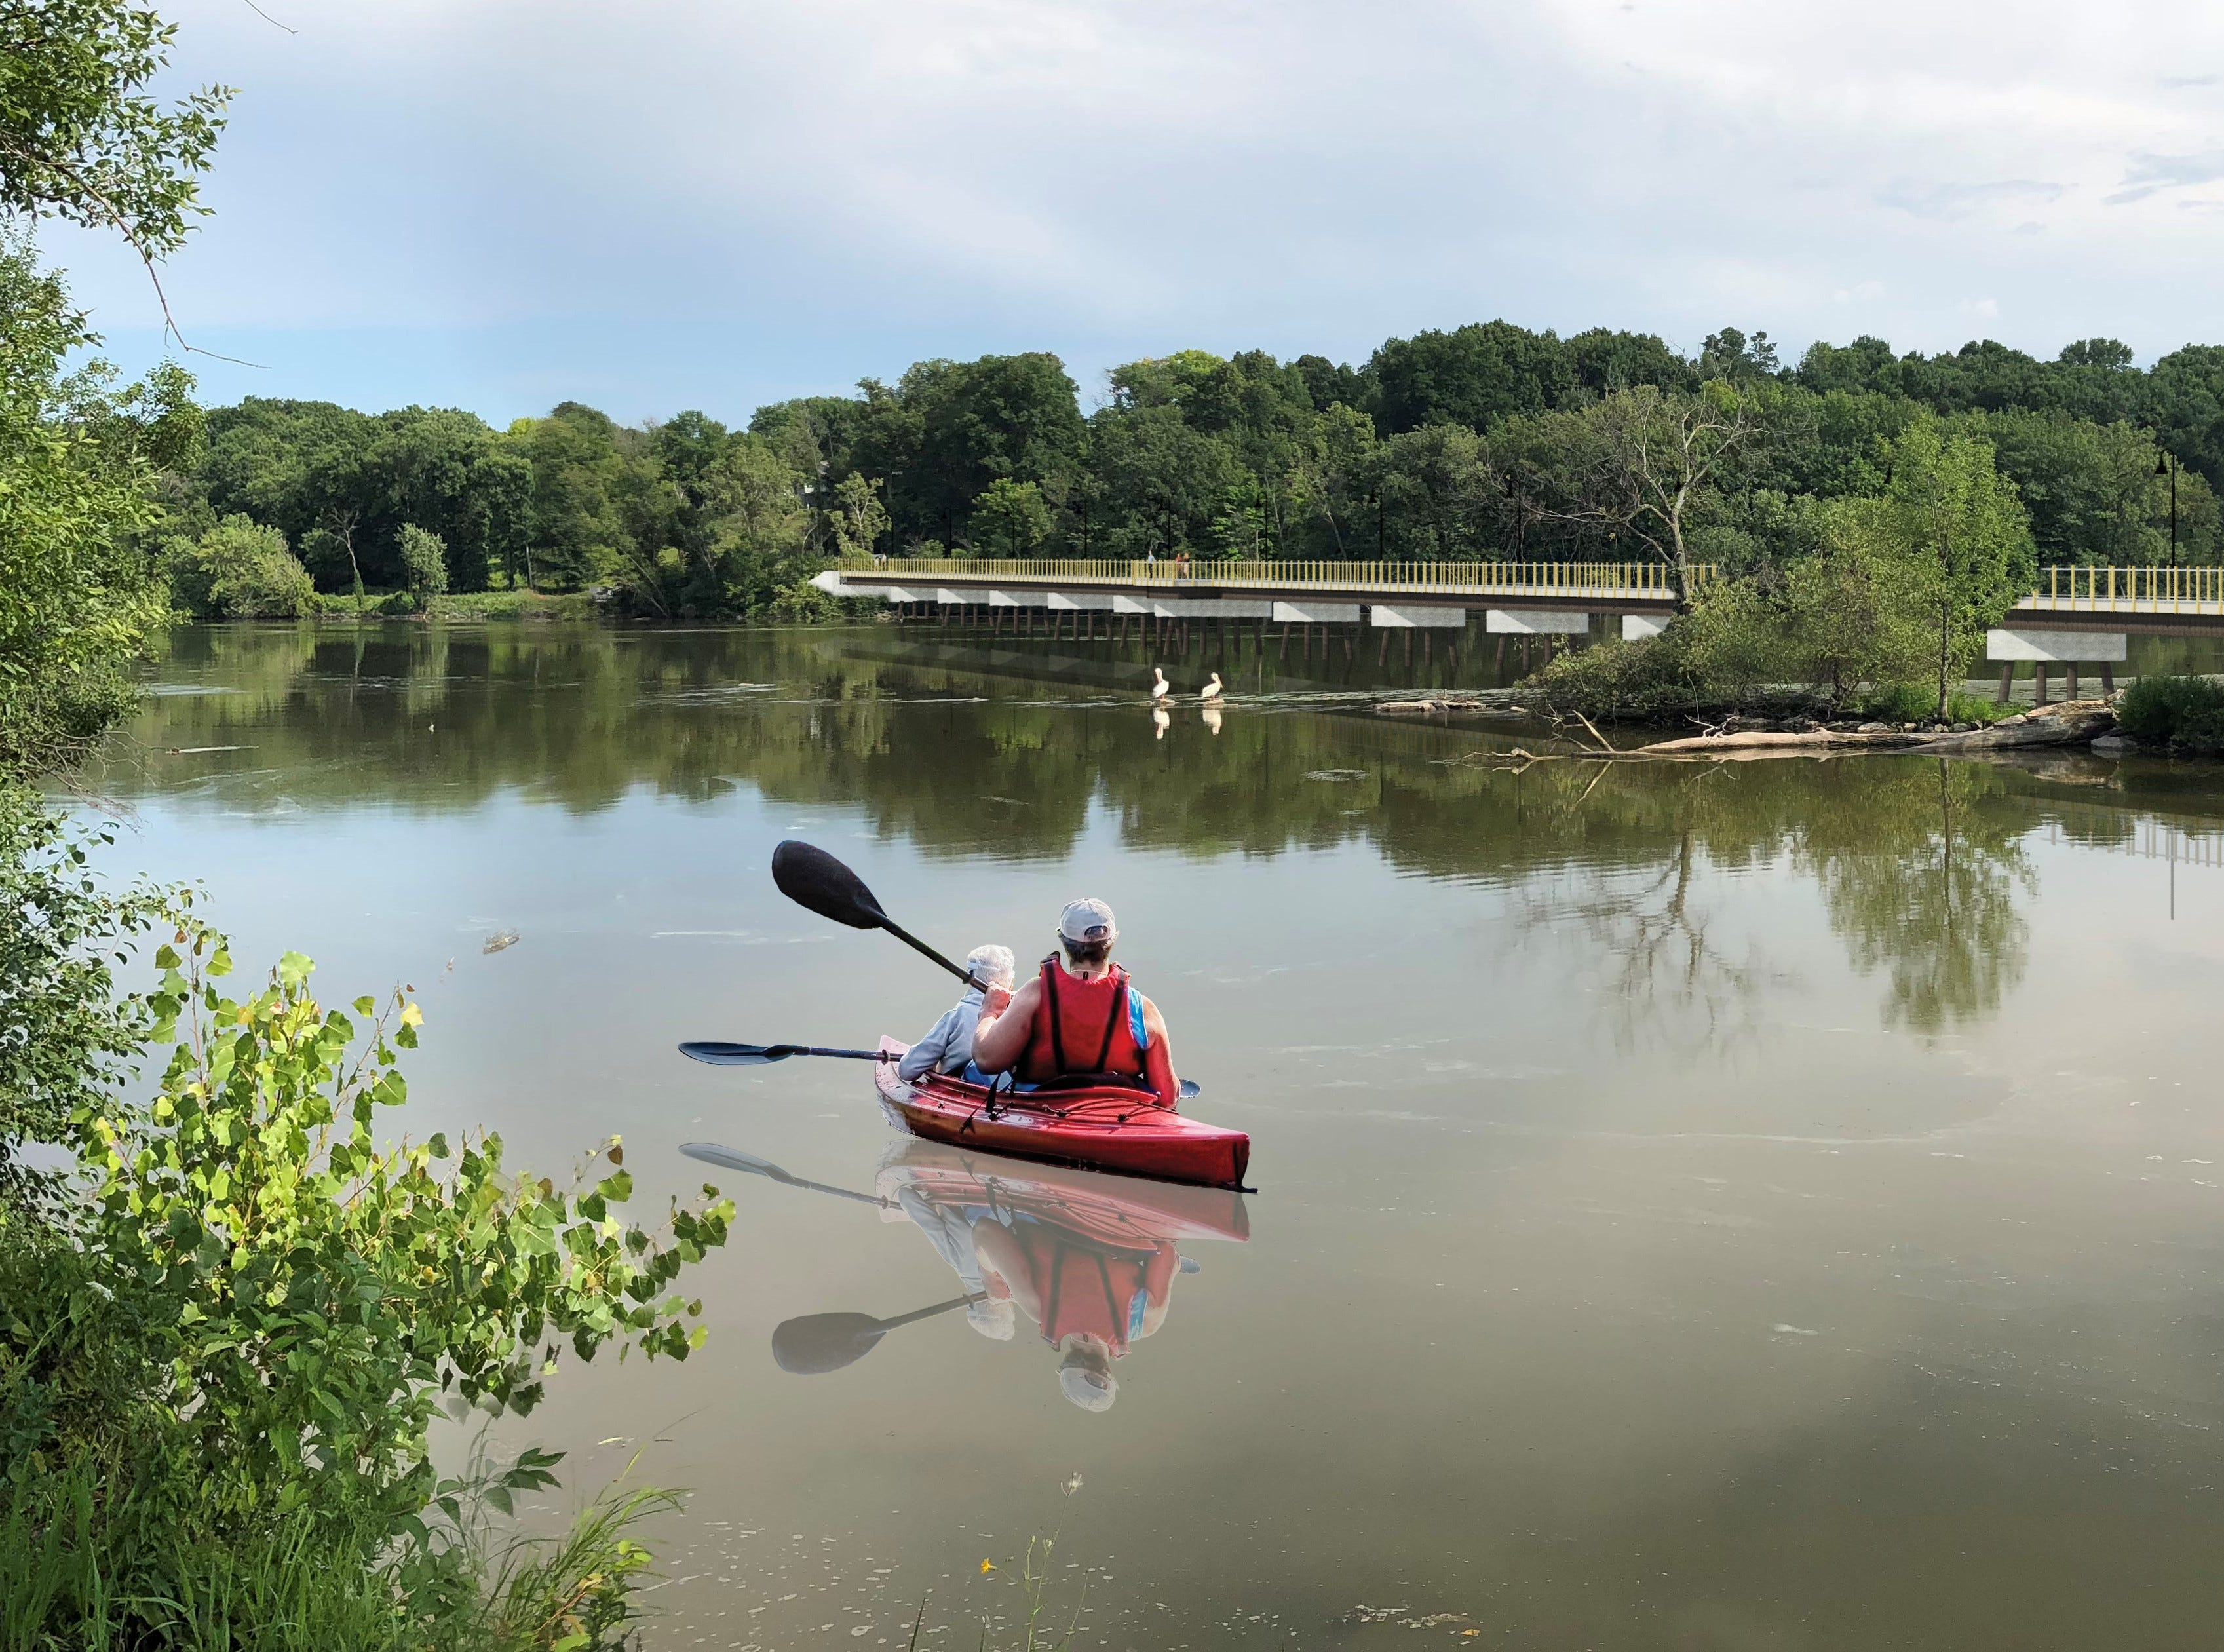 'Bridge for everyone': Kaukauna, Little Chute reach fundraising goal for Fox River Boardwalk